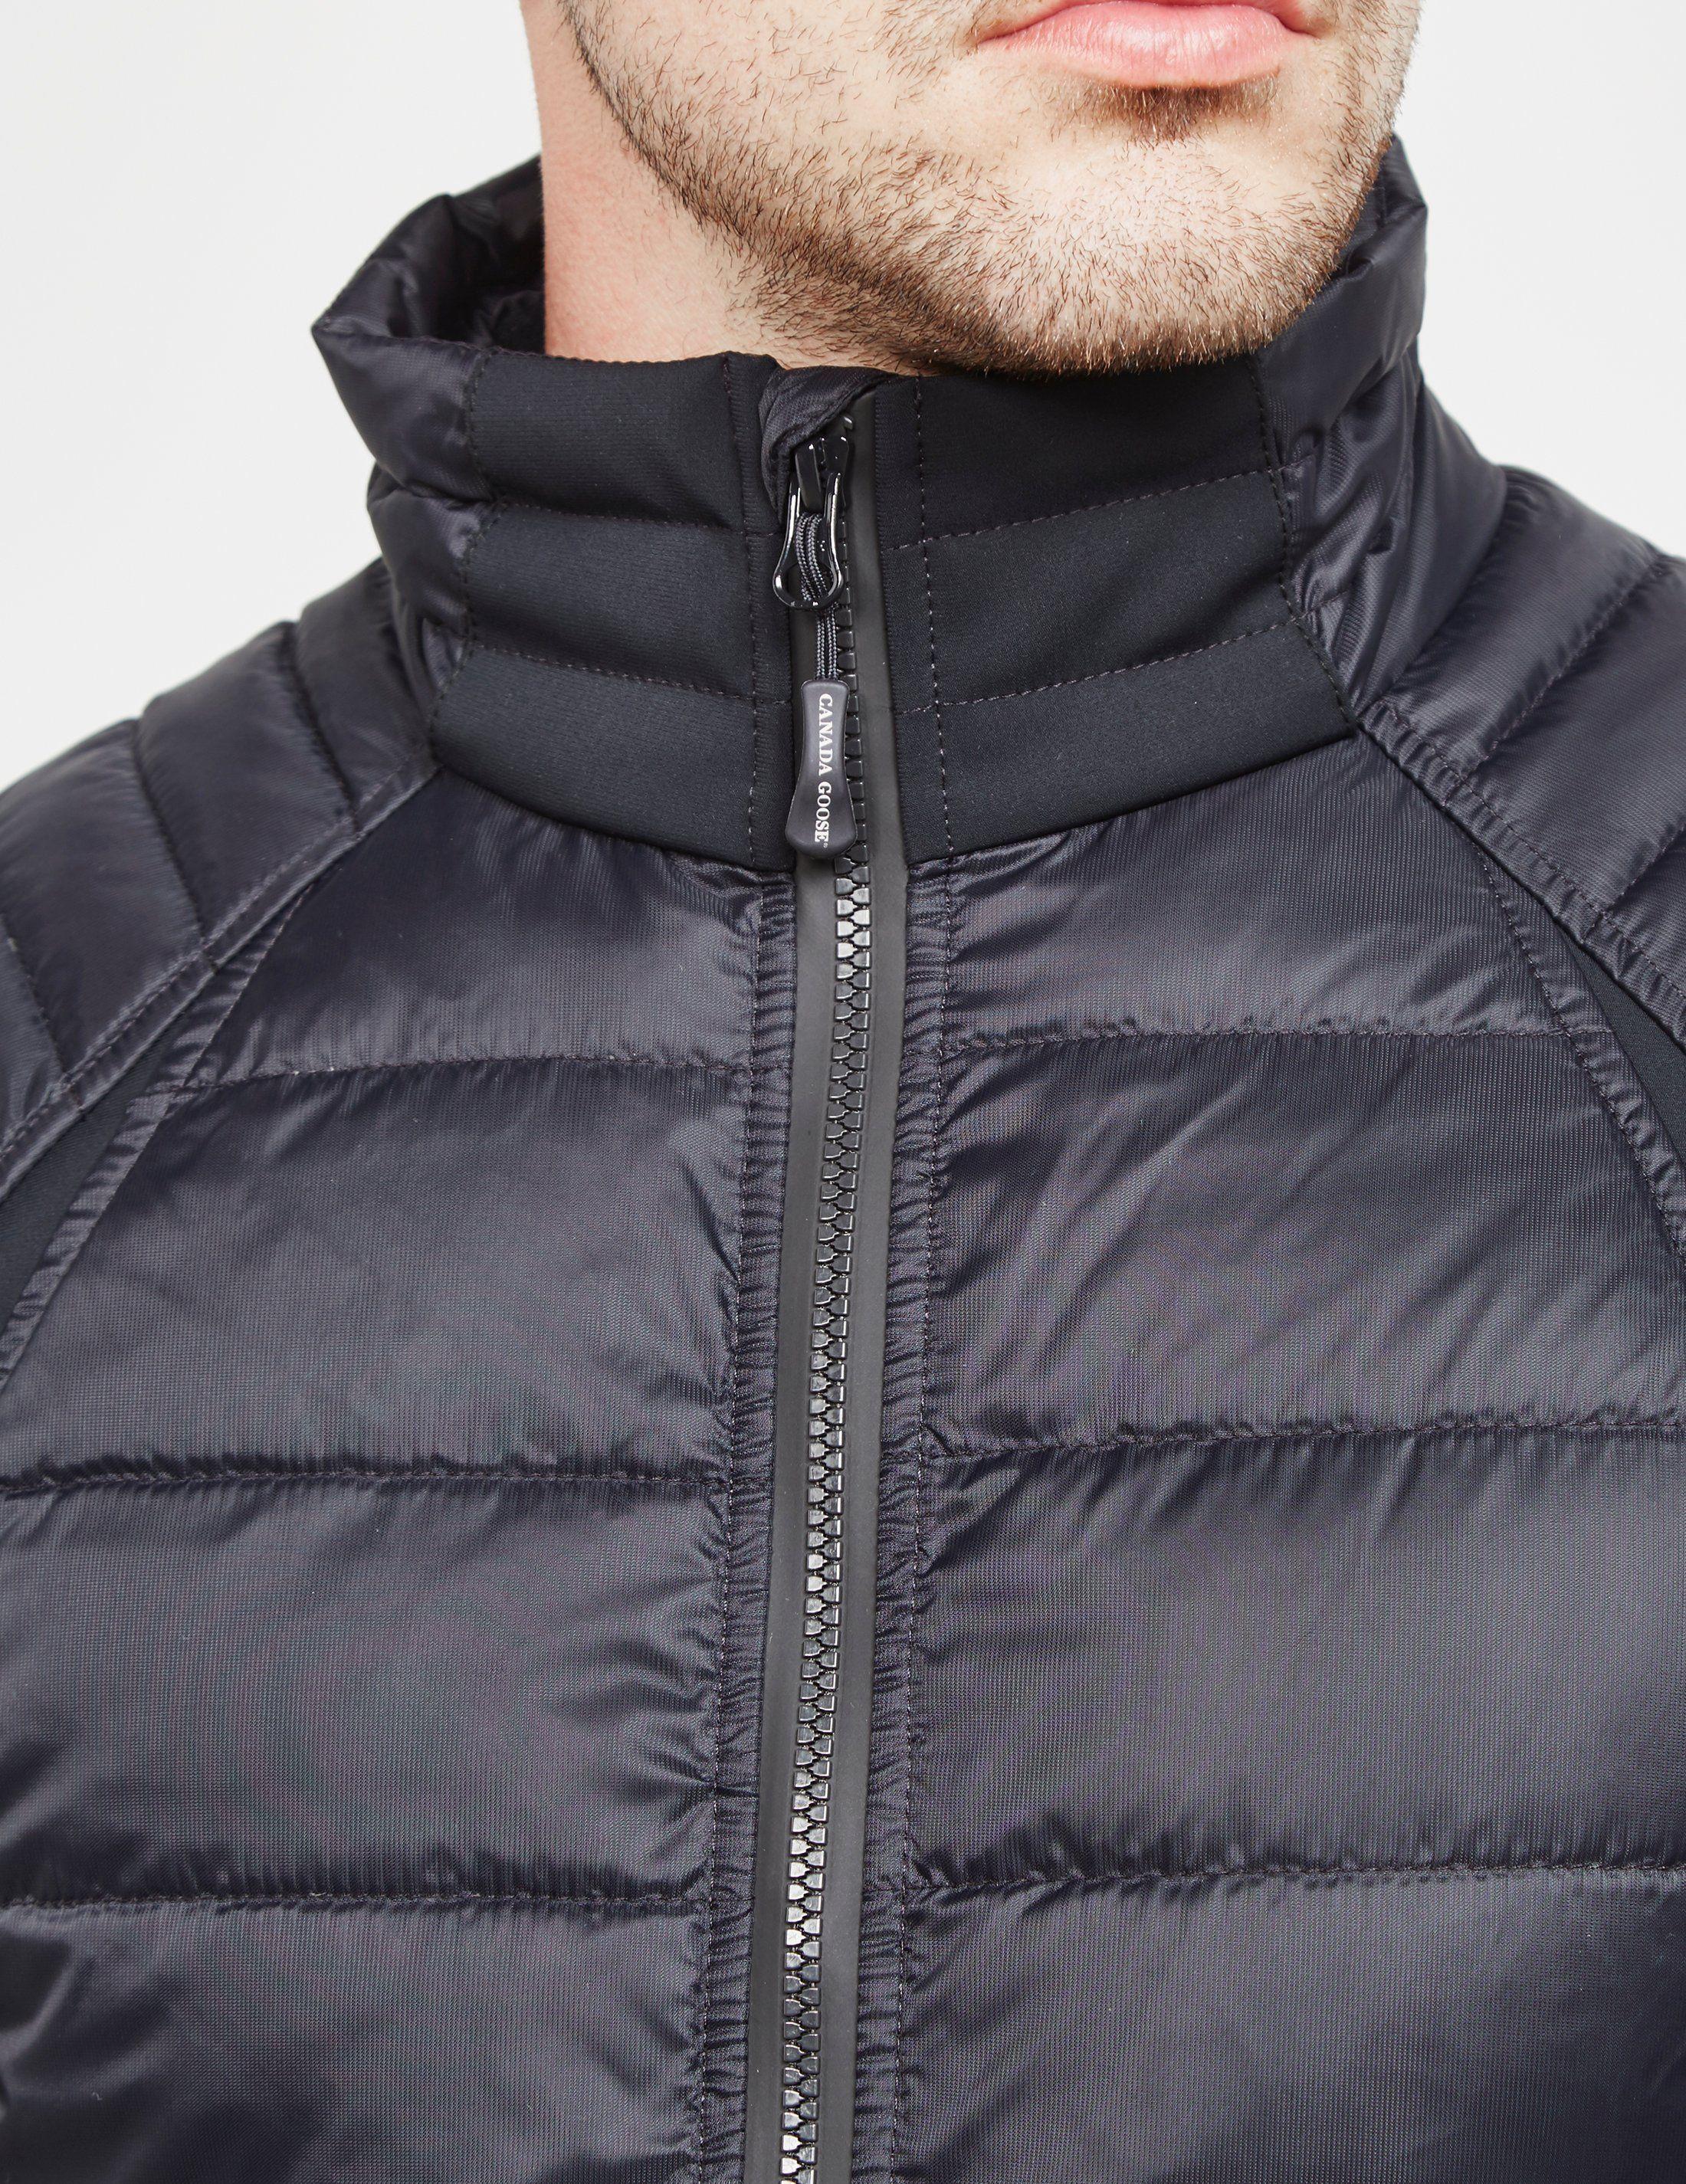 Canada Goose Hybridge Quilted Padded Jacket